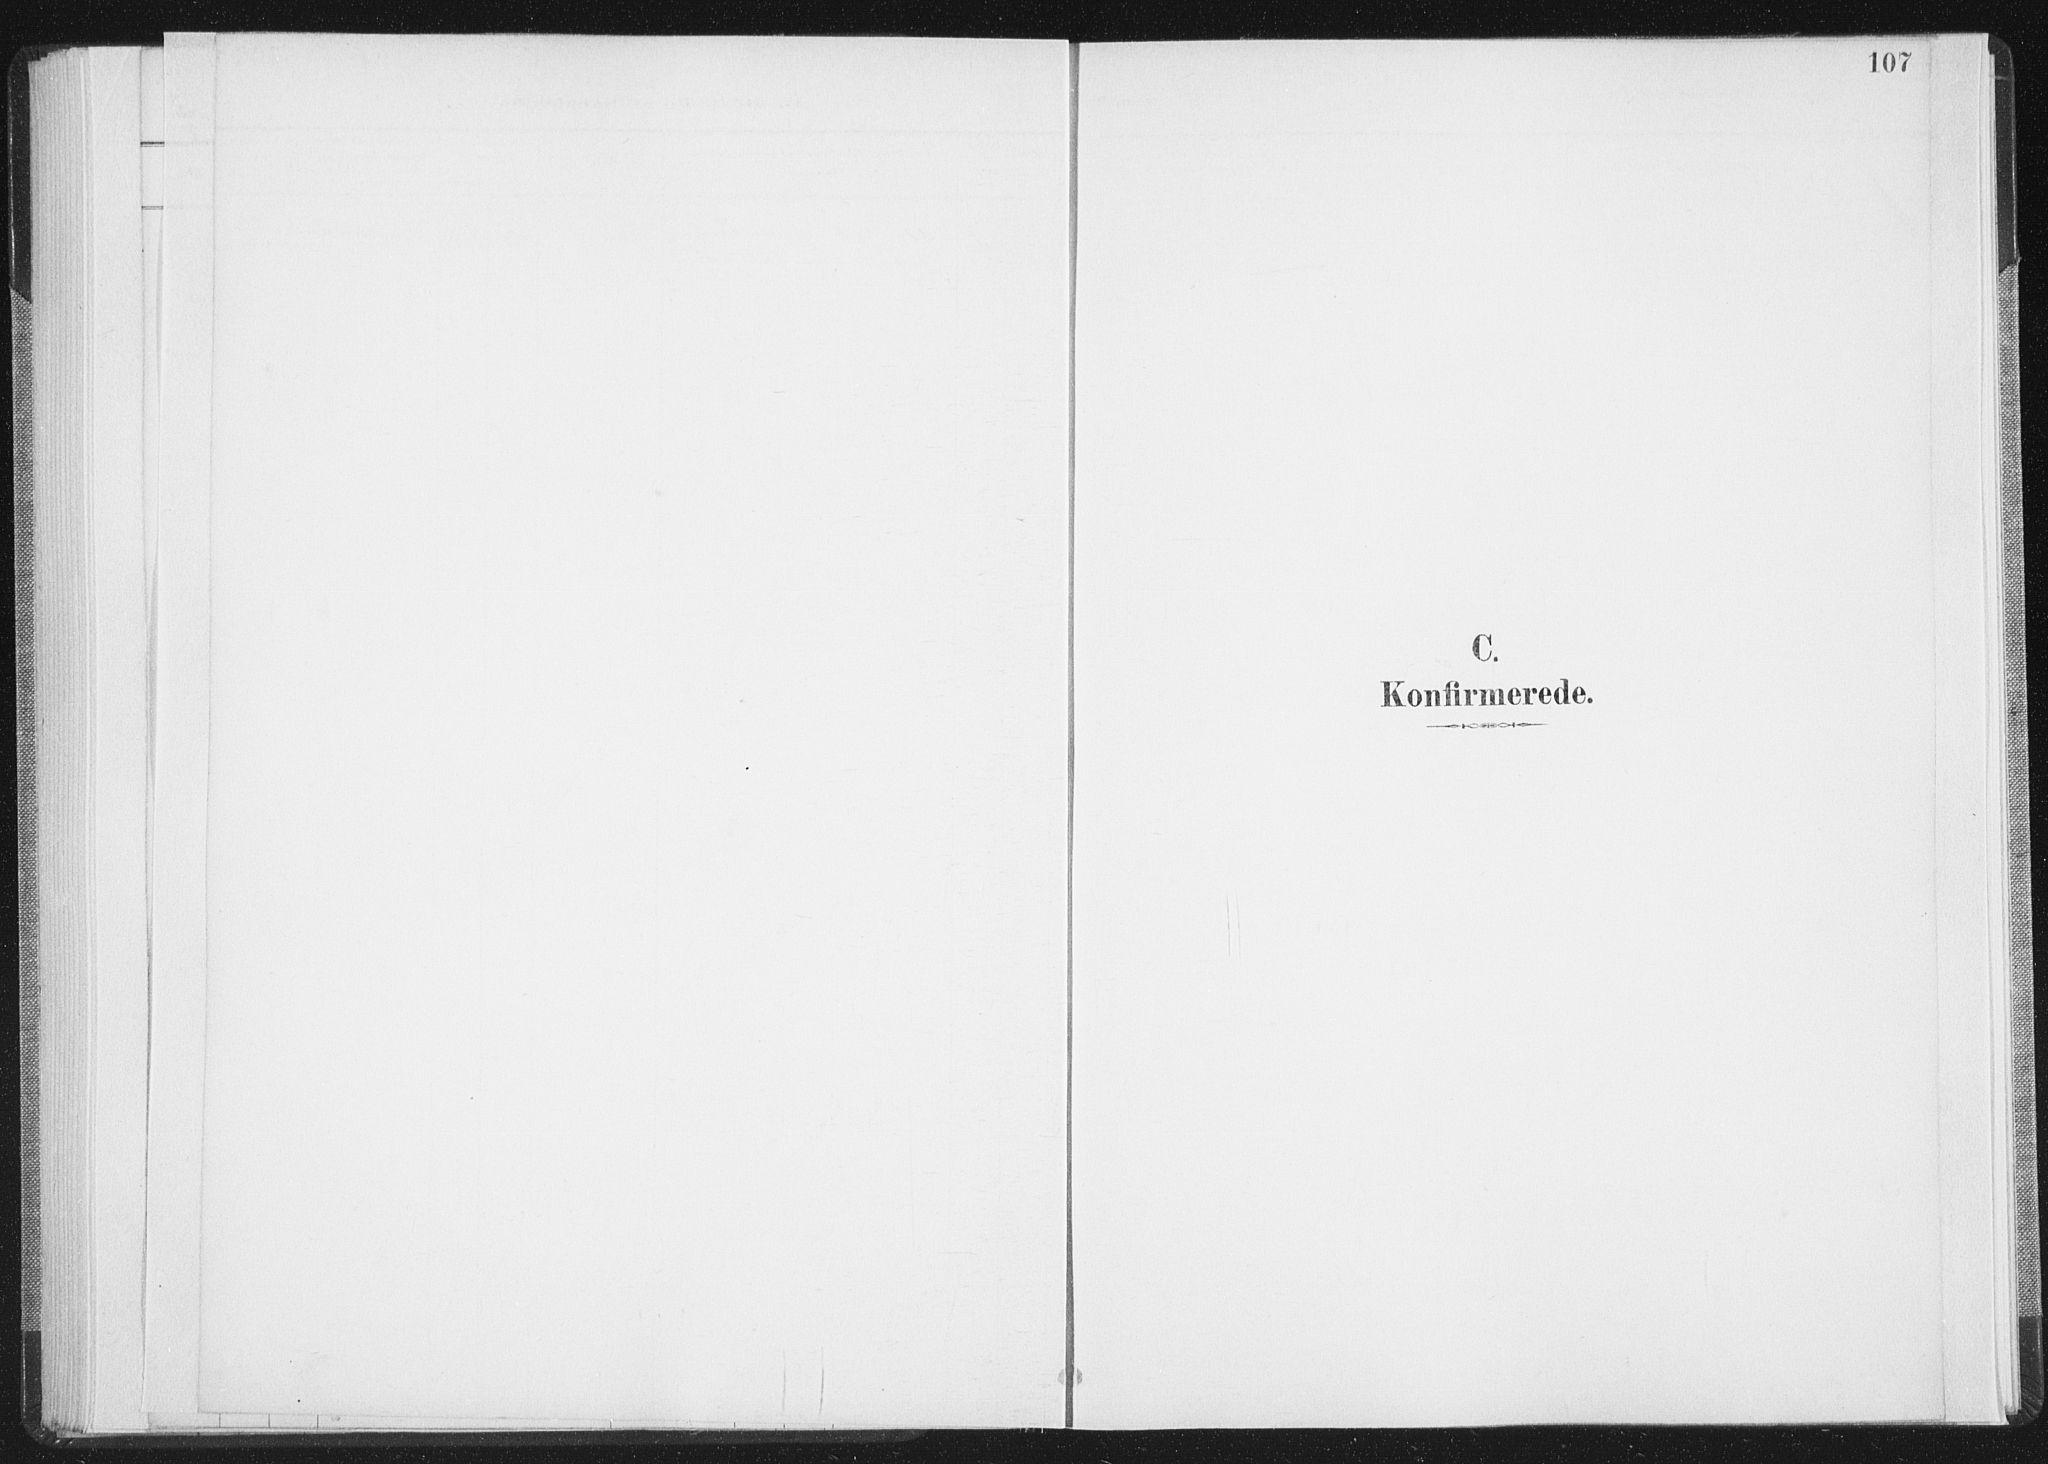 SAT, Ministerialprotokoller, klokkerbøker og fødselsregistre - Nordland, 898/L1422: Ministerialbok nr. 898A02, 1887-1908, s. 107